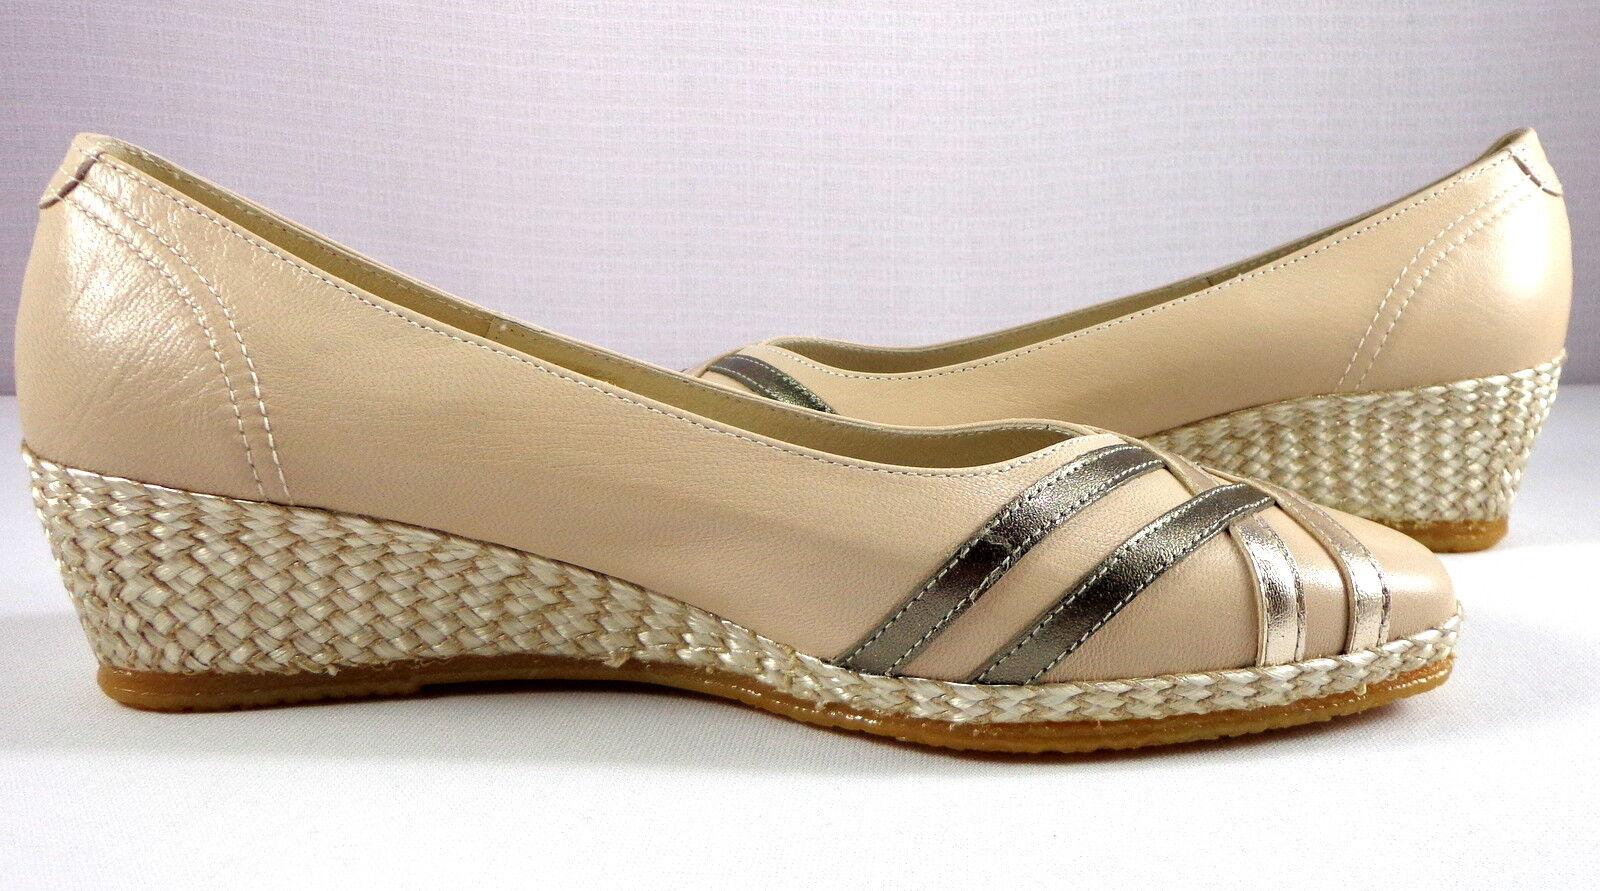 Damenschuhe Spiffy Wedge Heel Schuhes Cream Slip On Made Größe 9 EU 40 Made On in Spain with Box 46b683